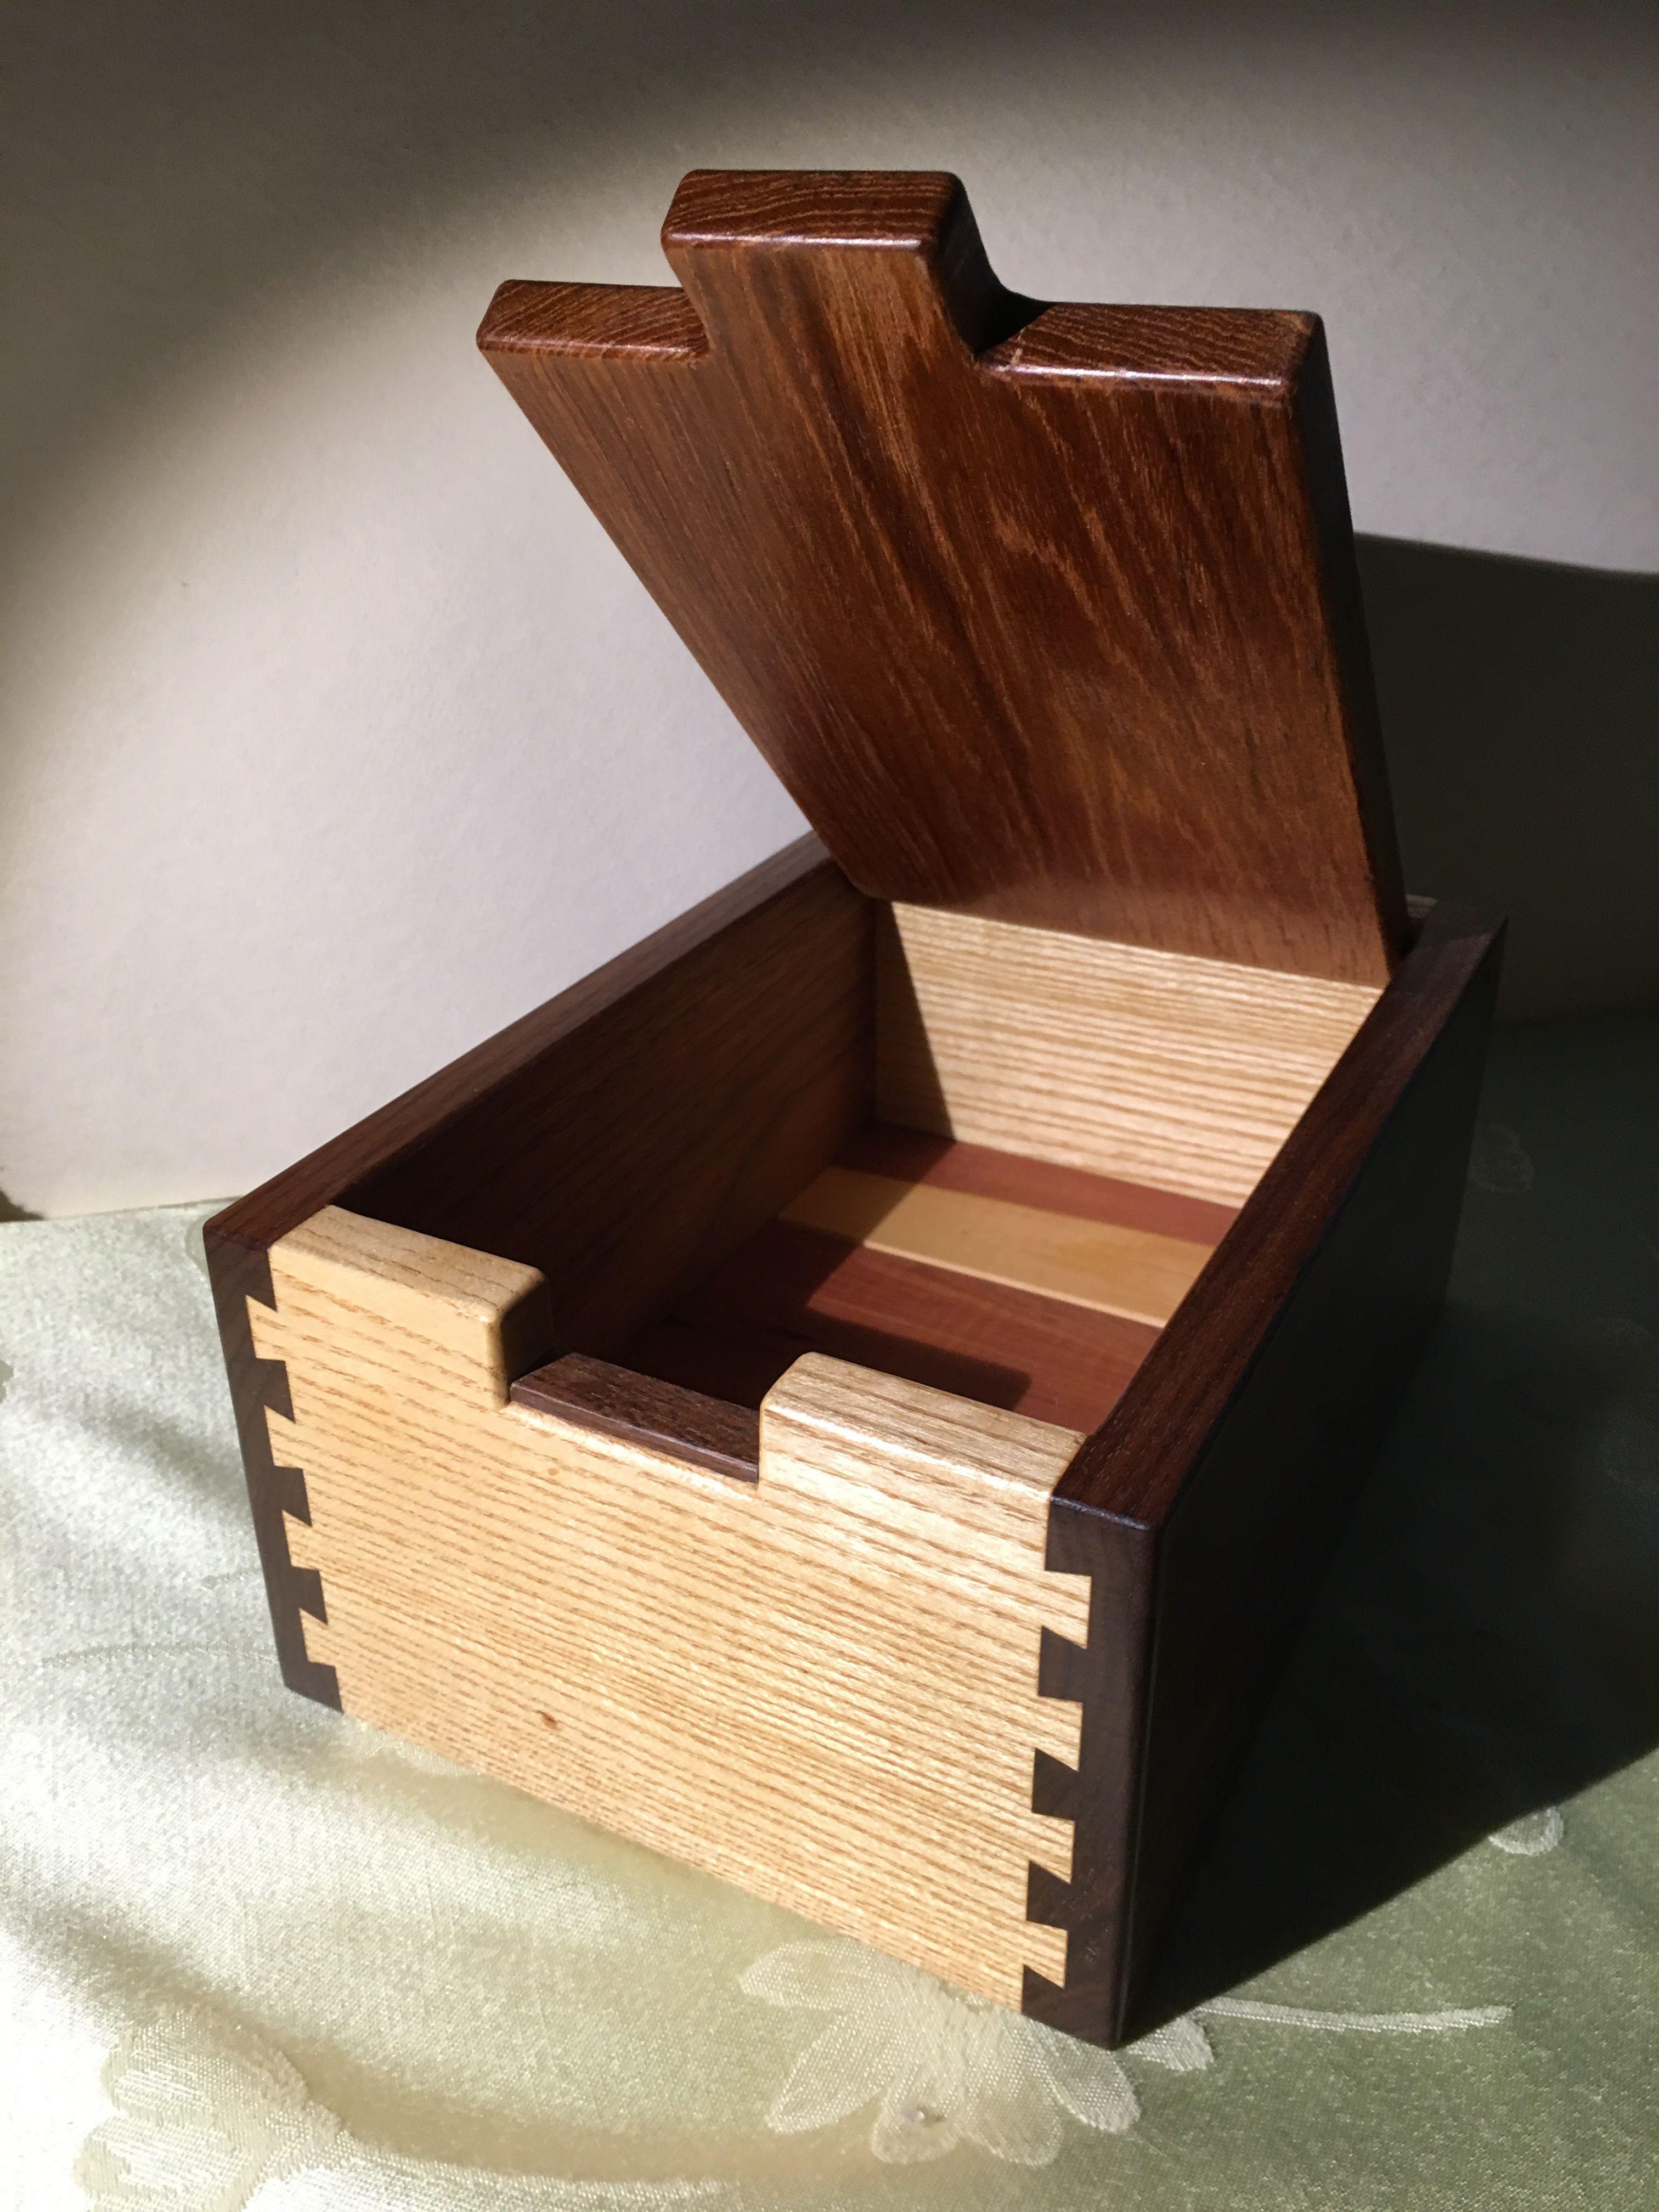 Dovetailed Walnut Hickory Teak Cedar Box 10 X 7 X 5 By Michael Mann Cedar Box Wood Art Teak